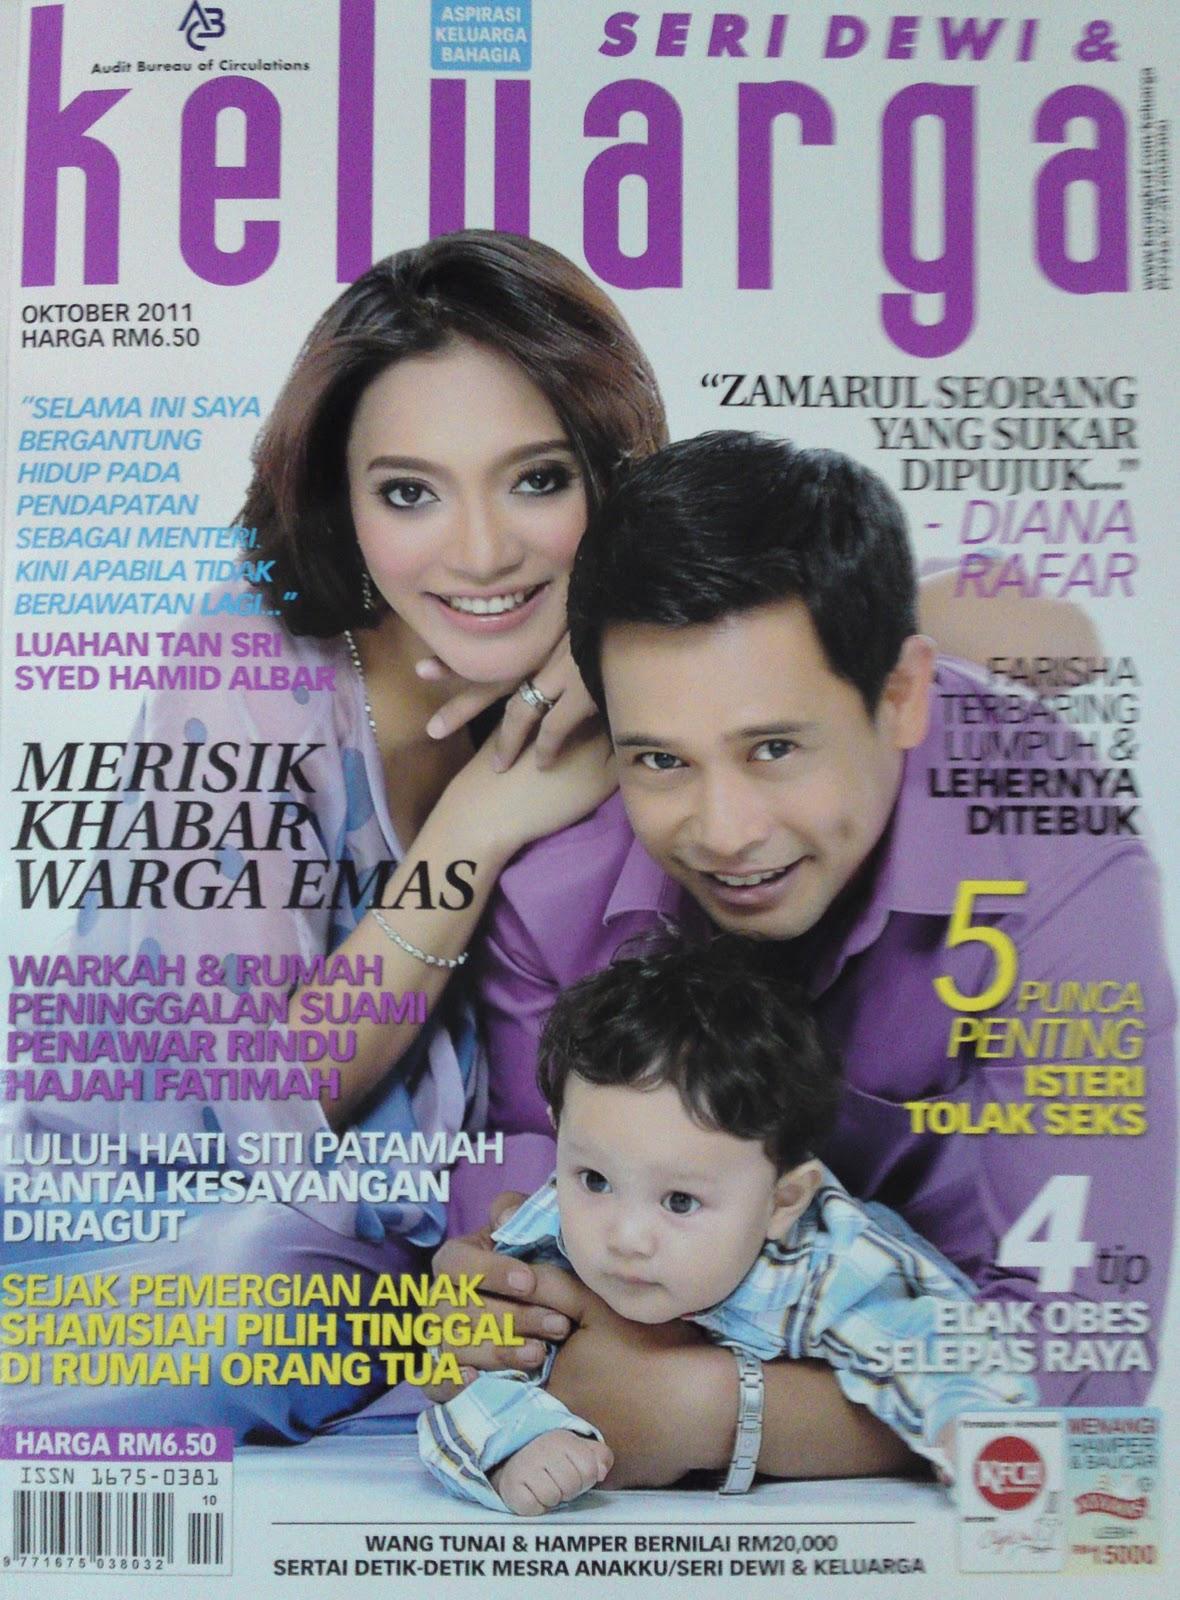 Majalah seri dewi &; keluarga